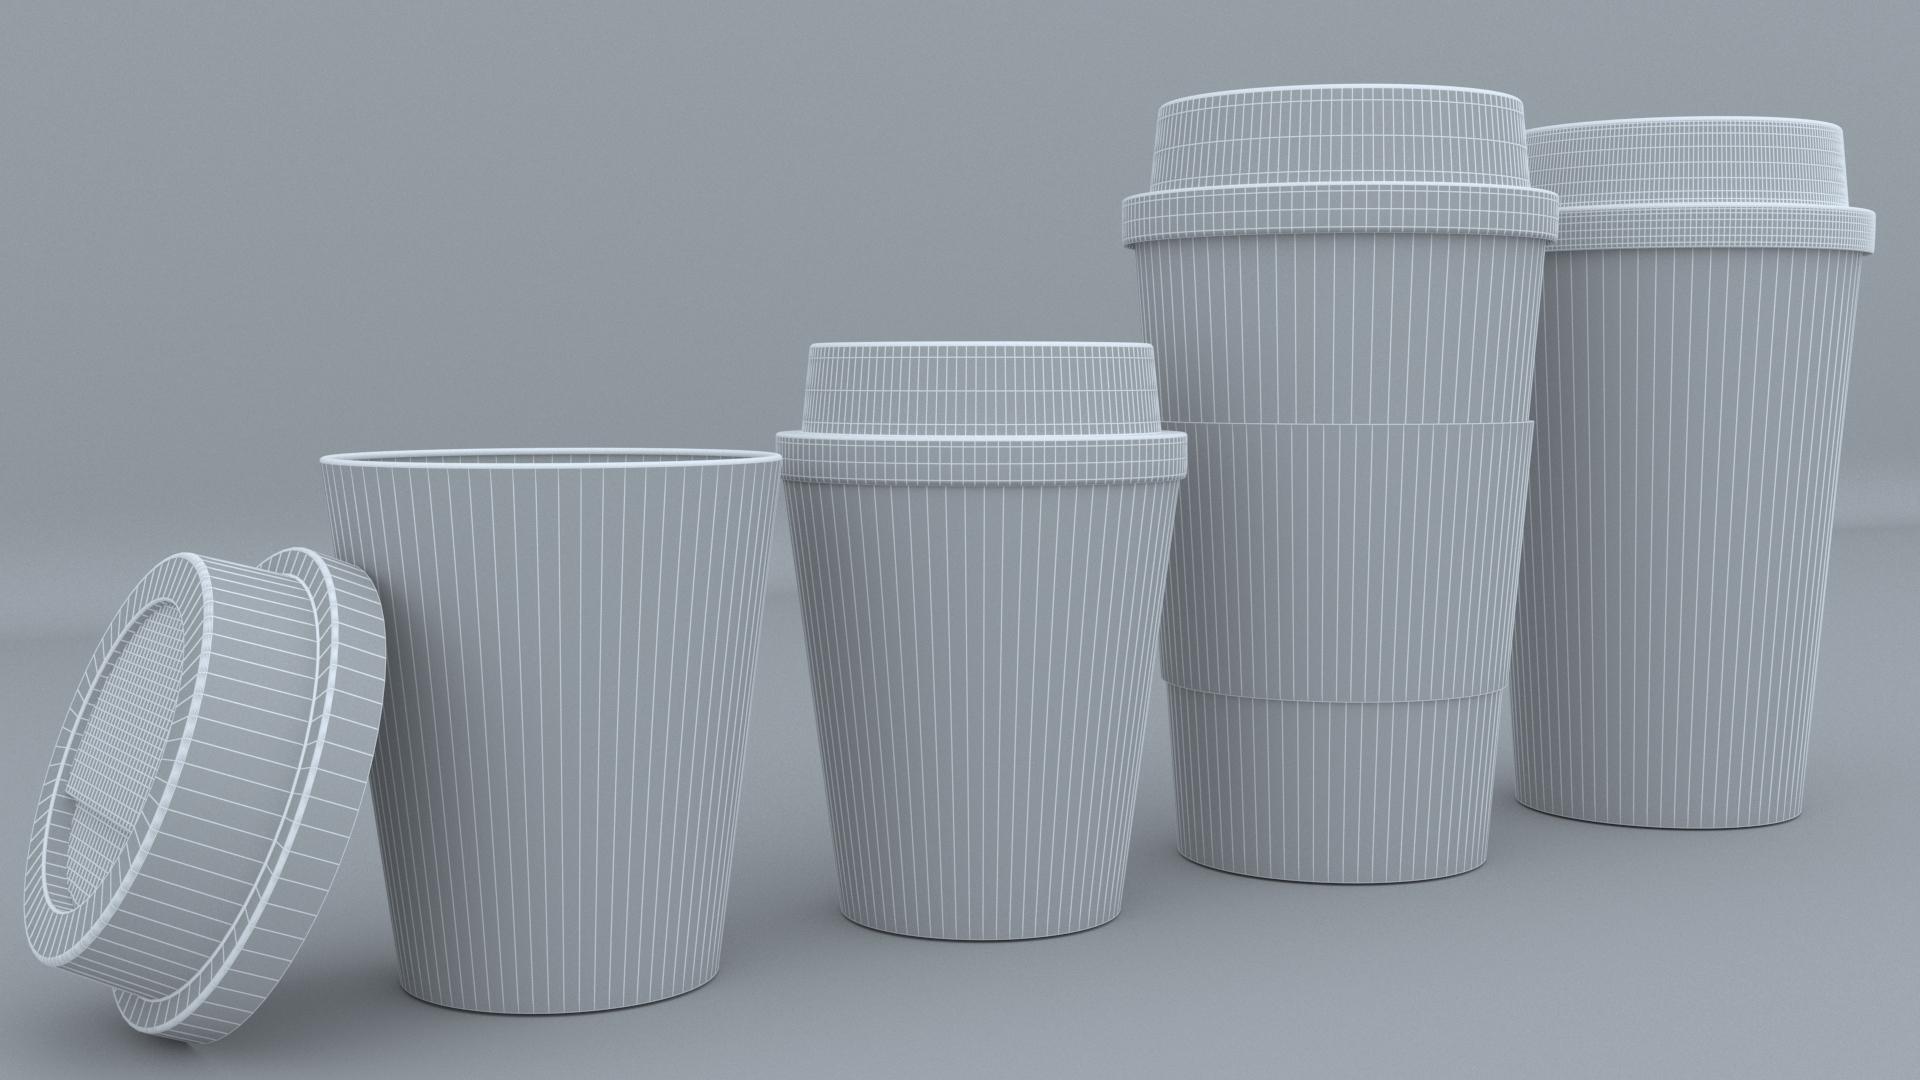 9.jpg Download STL file Coffee Cup • 3D printing template, illusioncreators1979